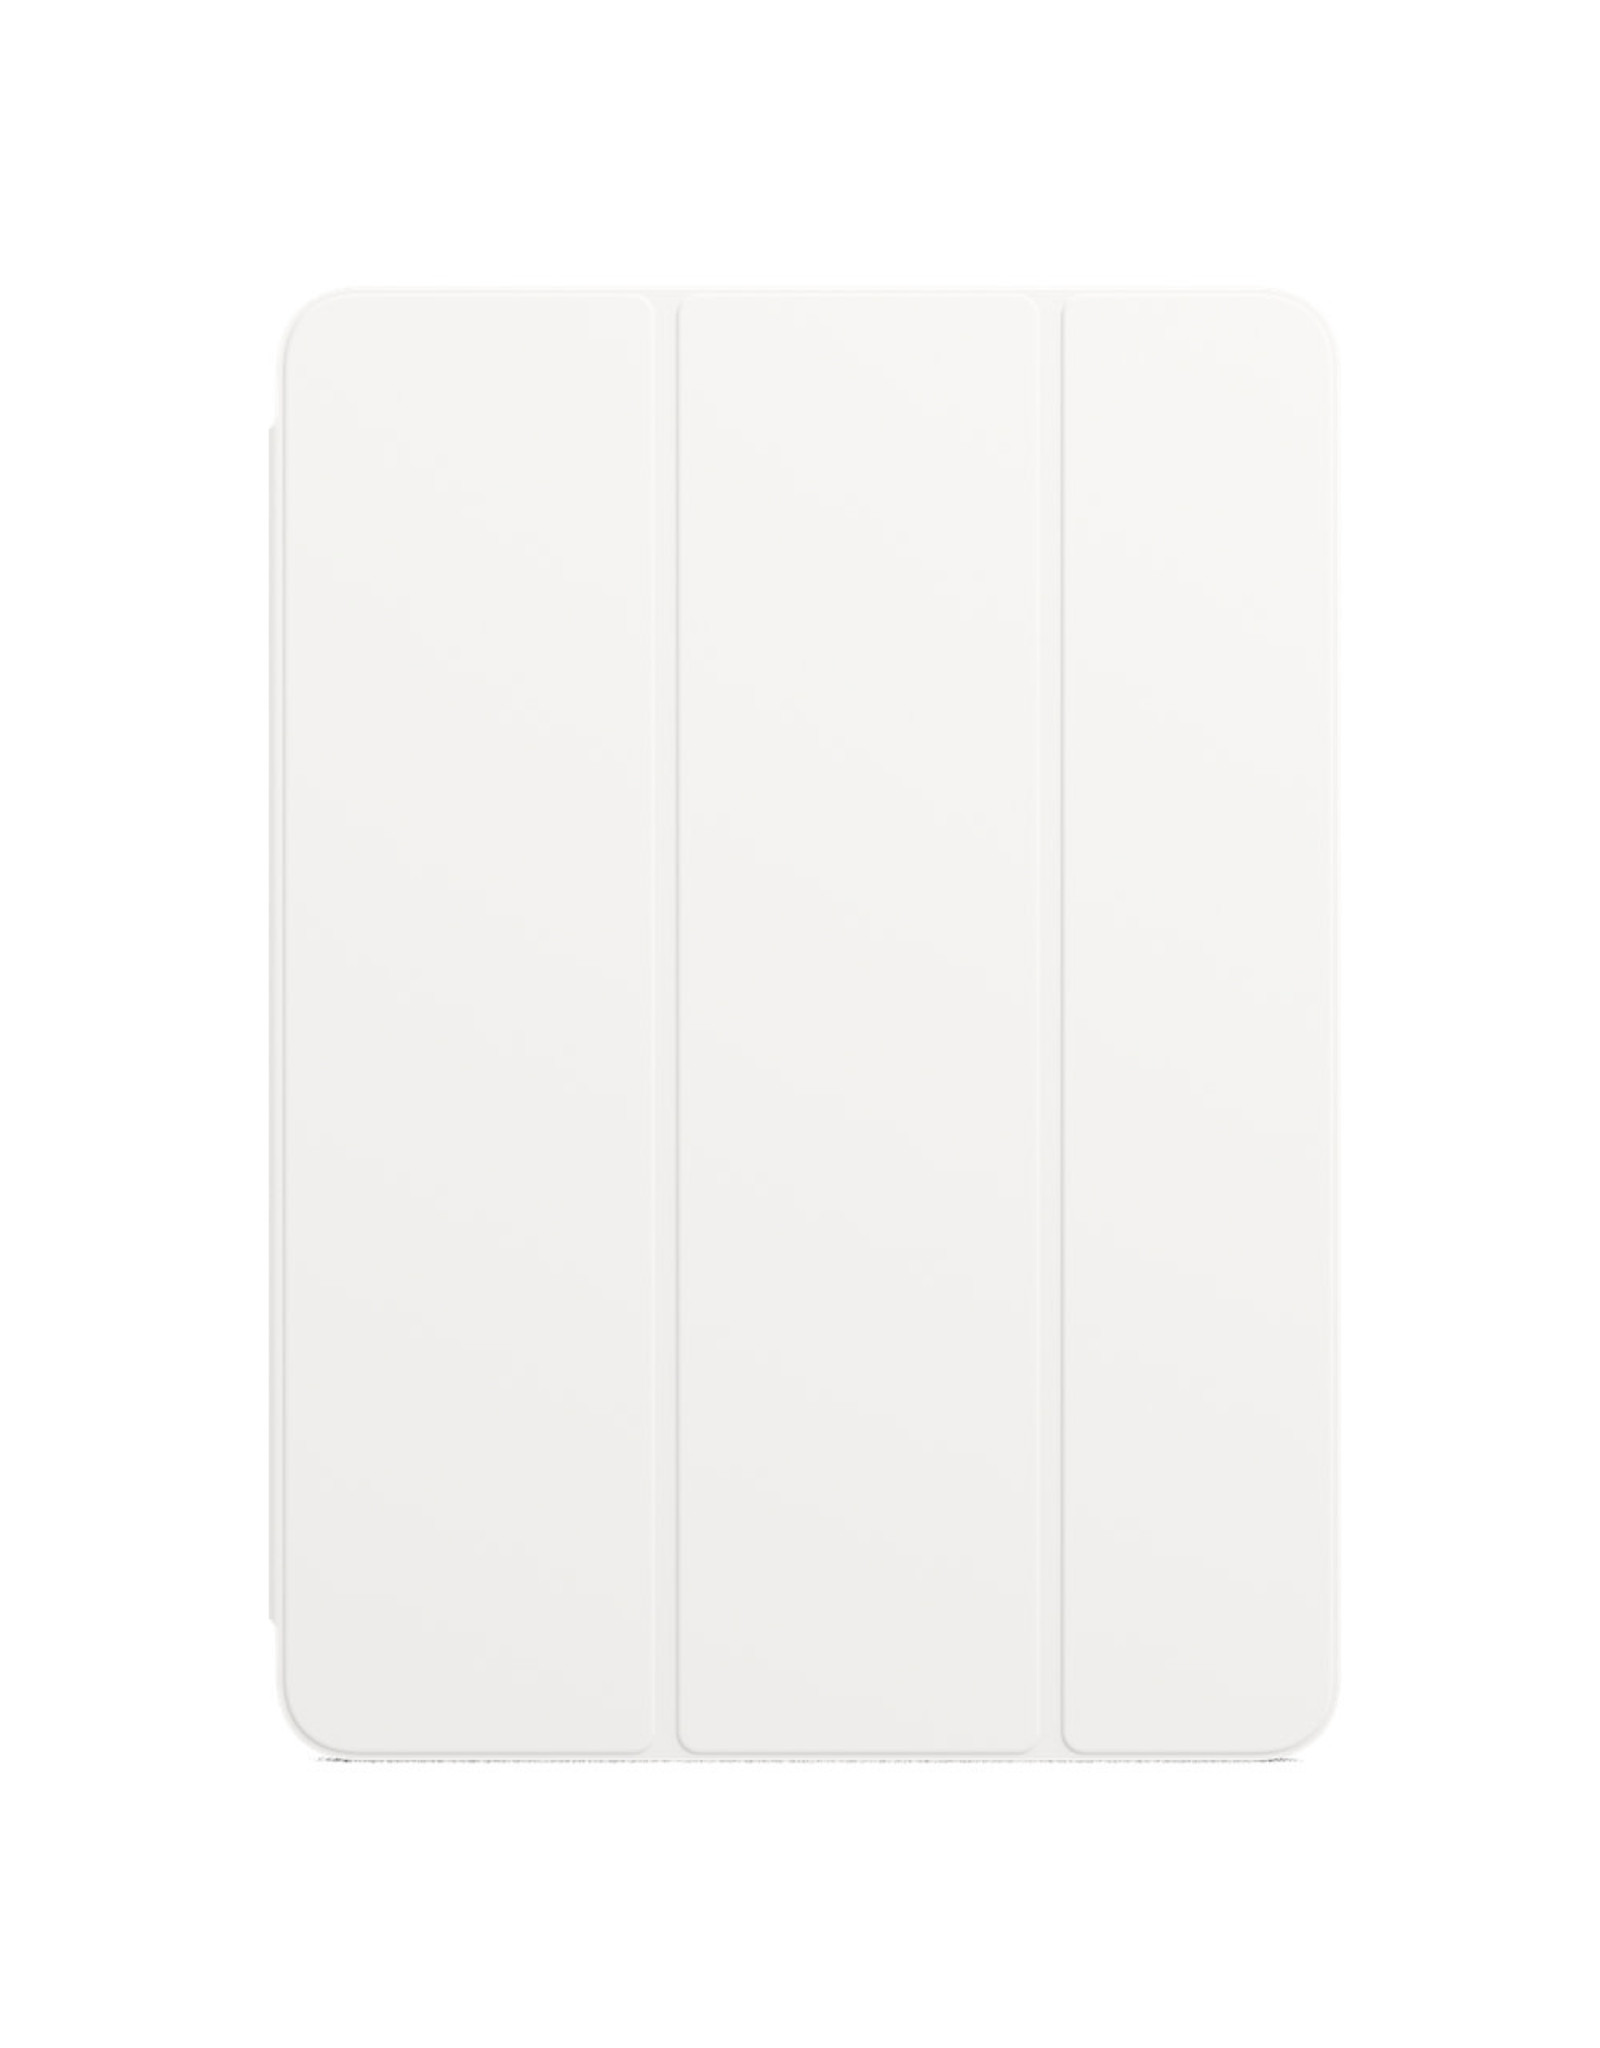 Apple Apple Smart Folio for iPad Pro 11-inch (3rd generation) - White